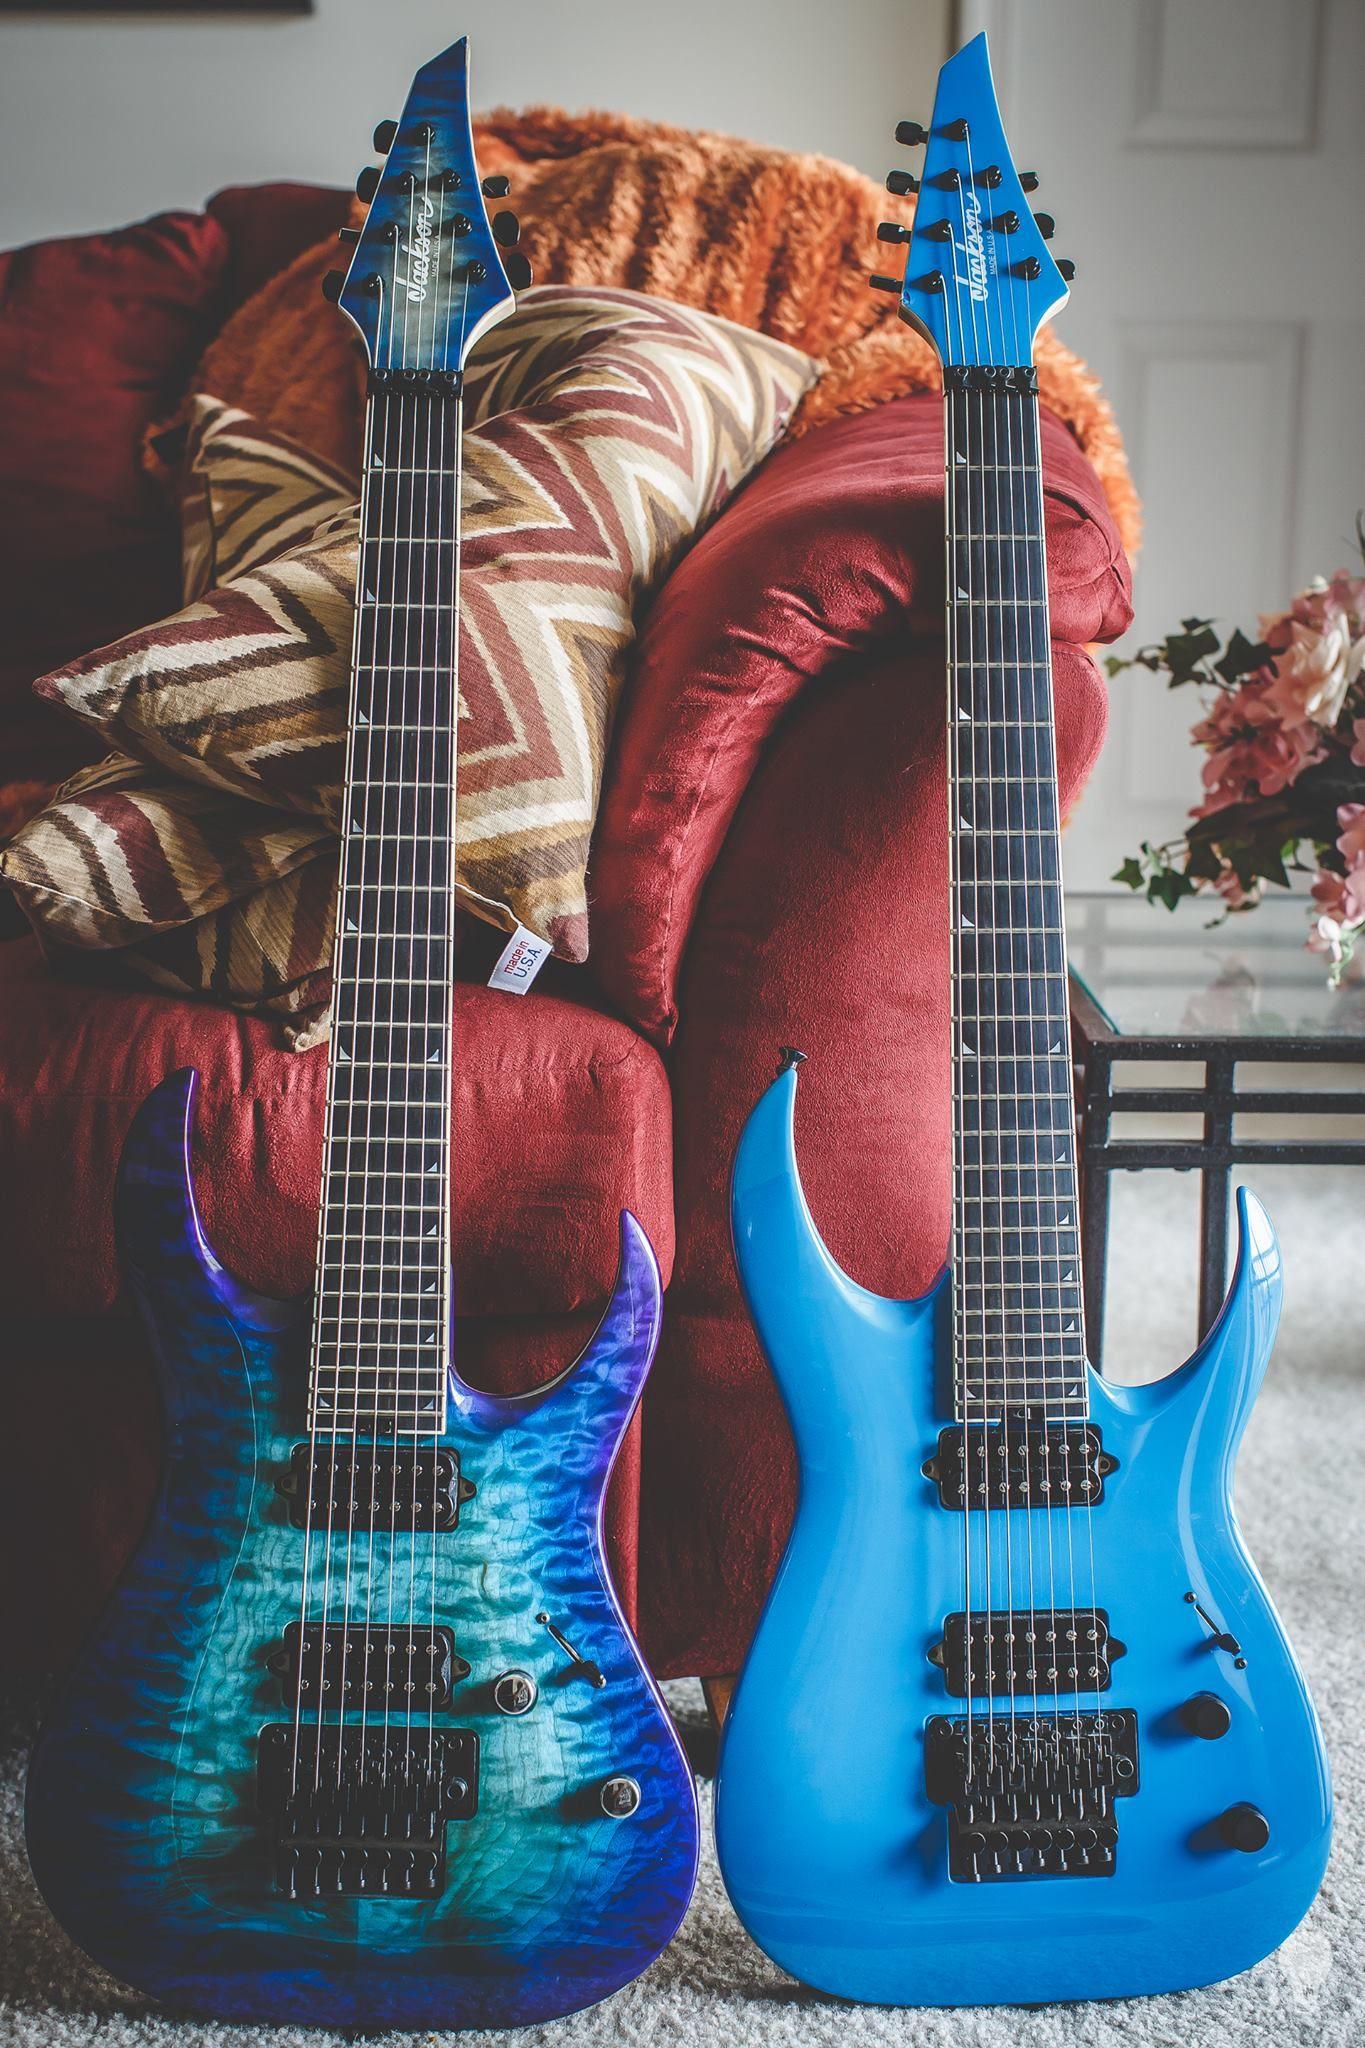 jackson custom shop 7 strings owned by misha mansoor 7 string guitars guitar music guitar. Black Bedroom Furniture Sets. Home Design Ideas